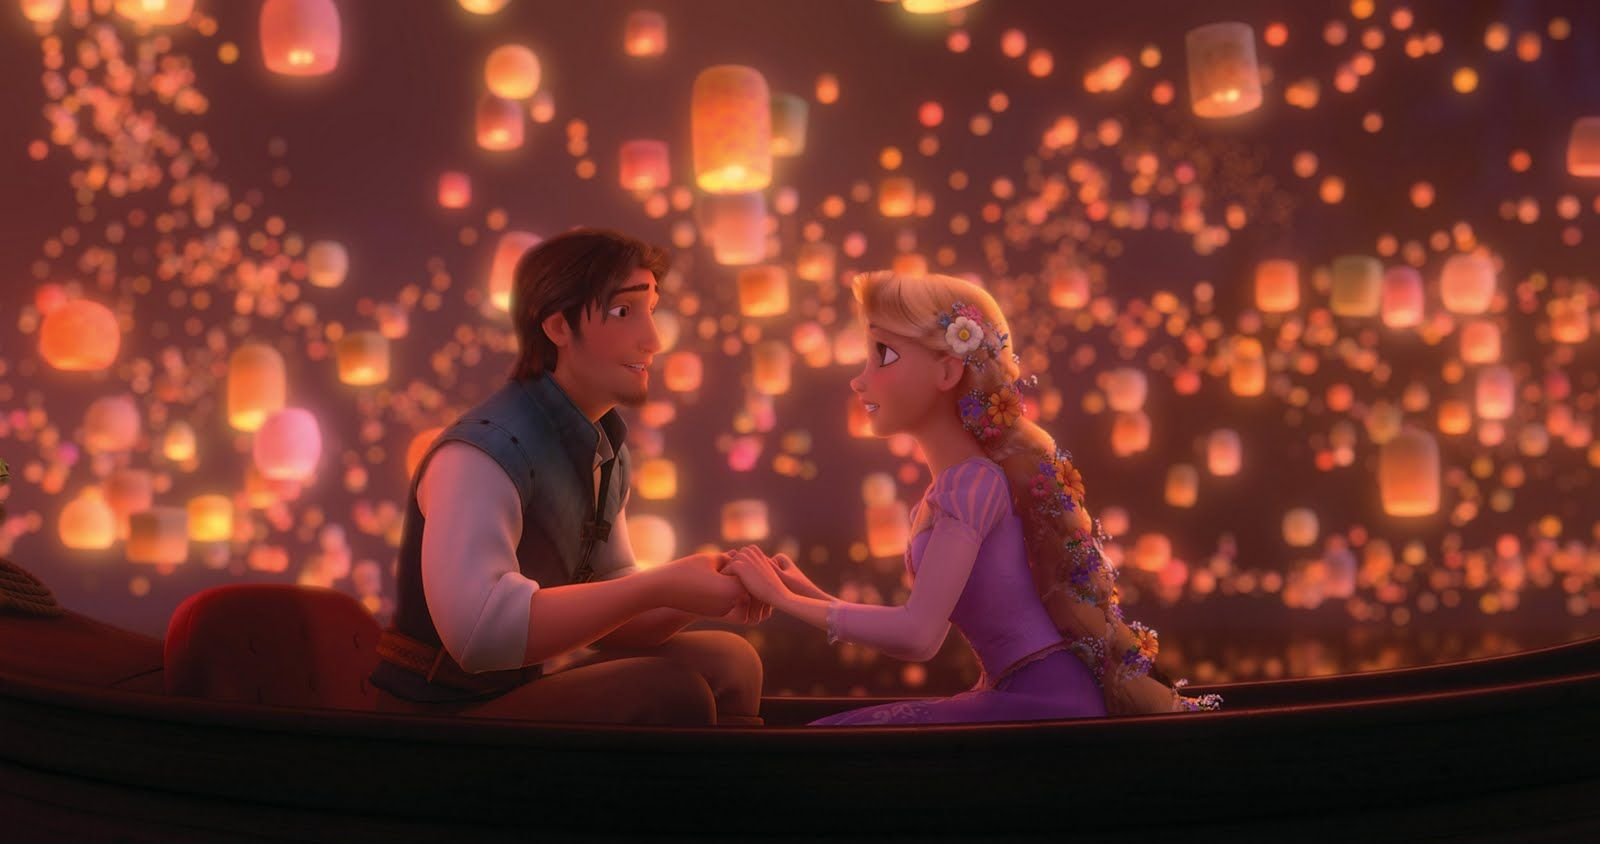 Tangled! sweet | Junk Drawer | Pinterest | Floating lanterns ... for Sky Lanterns Rapunzel  146hul